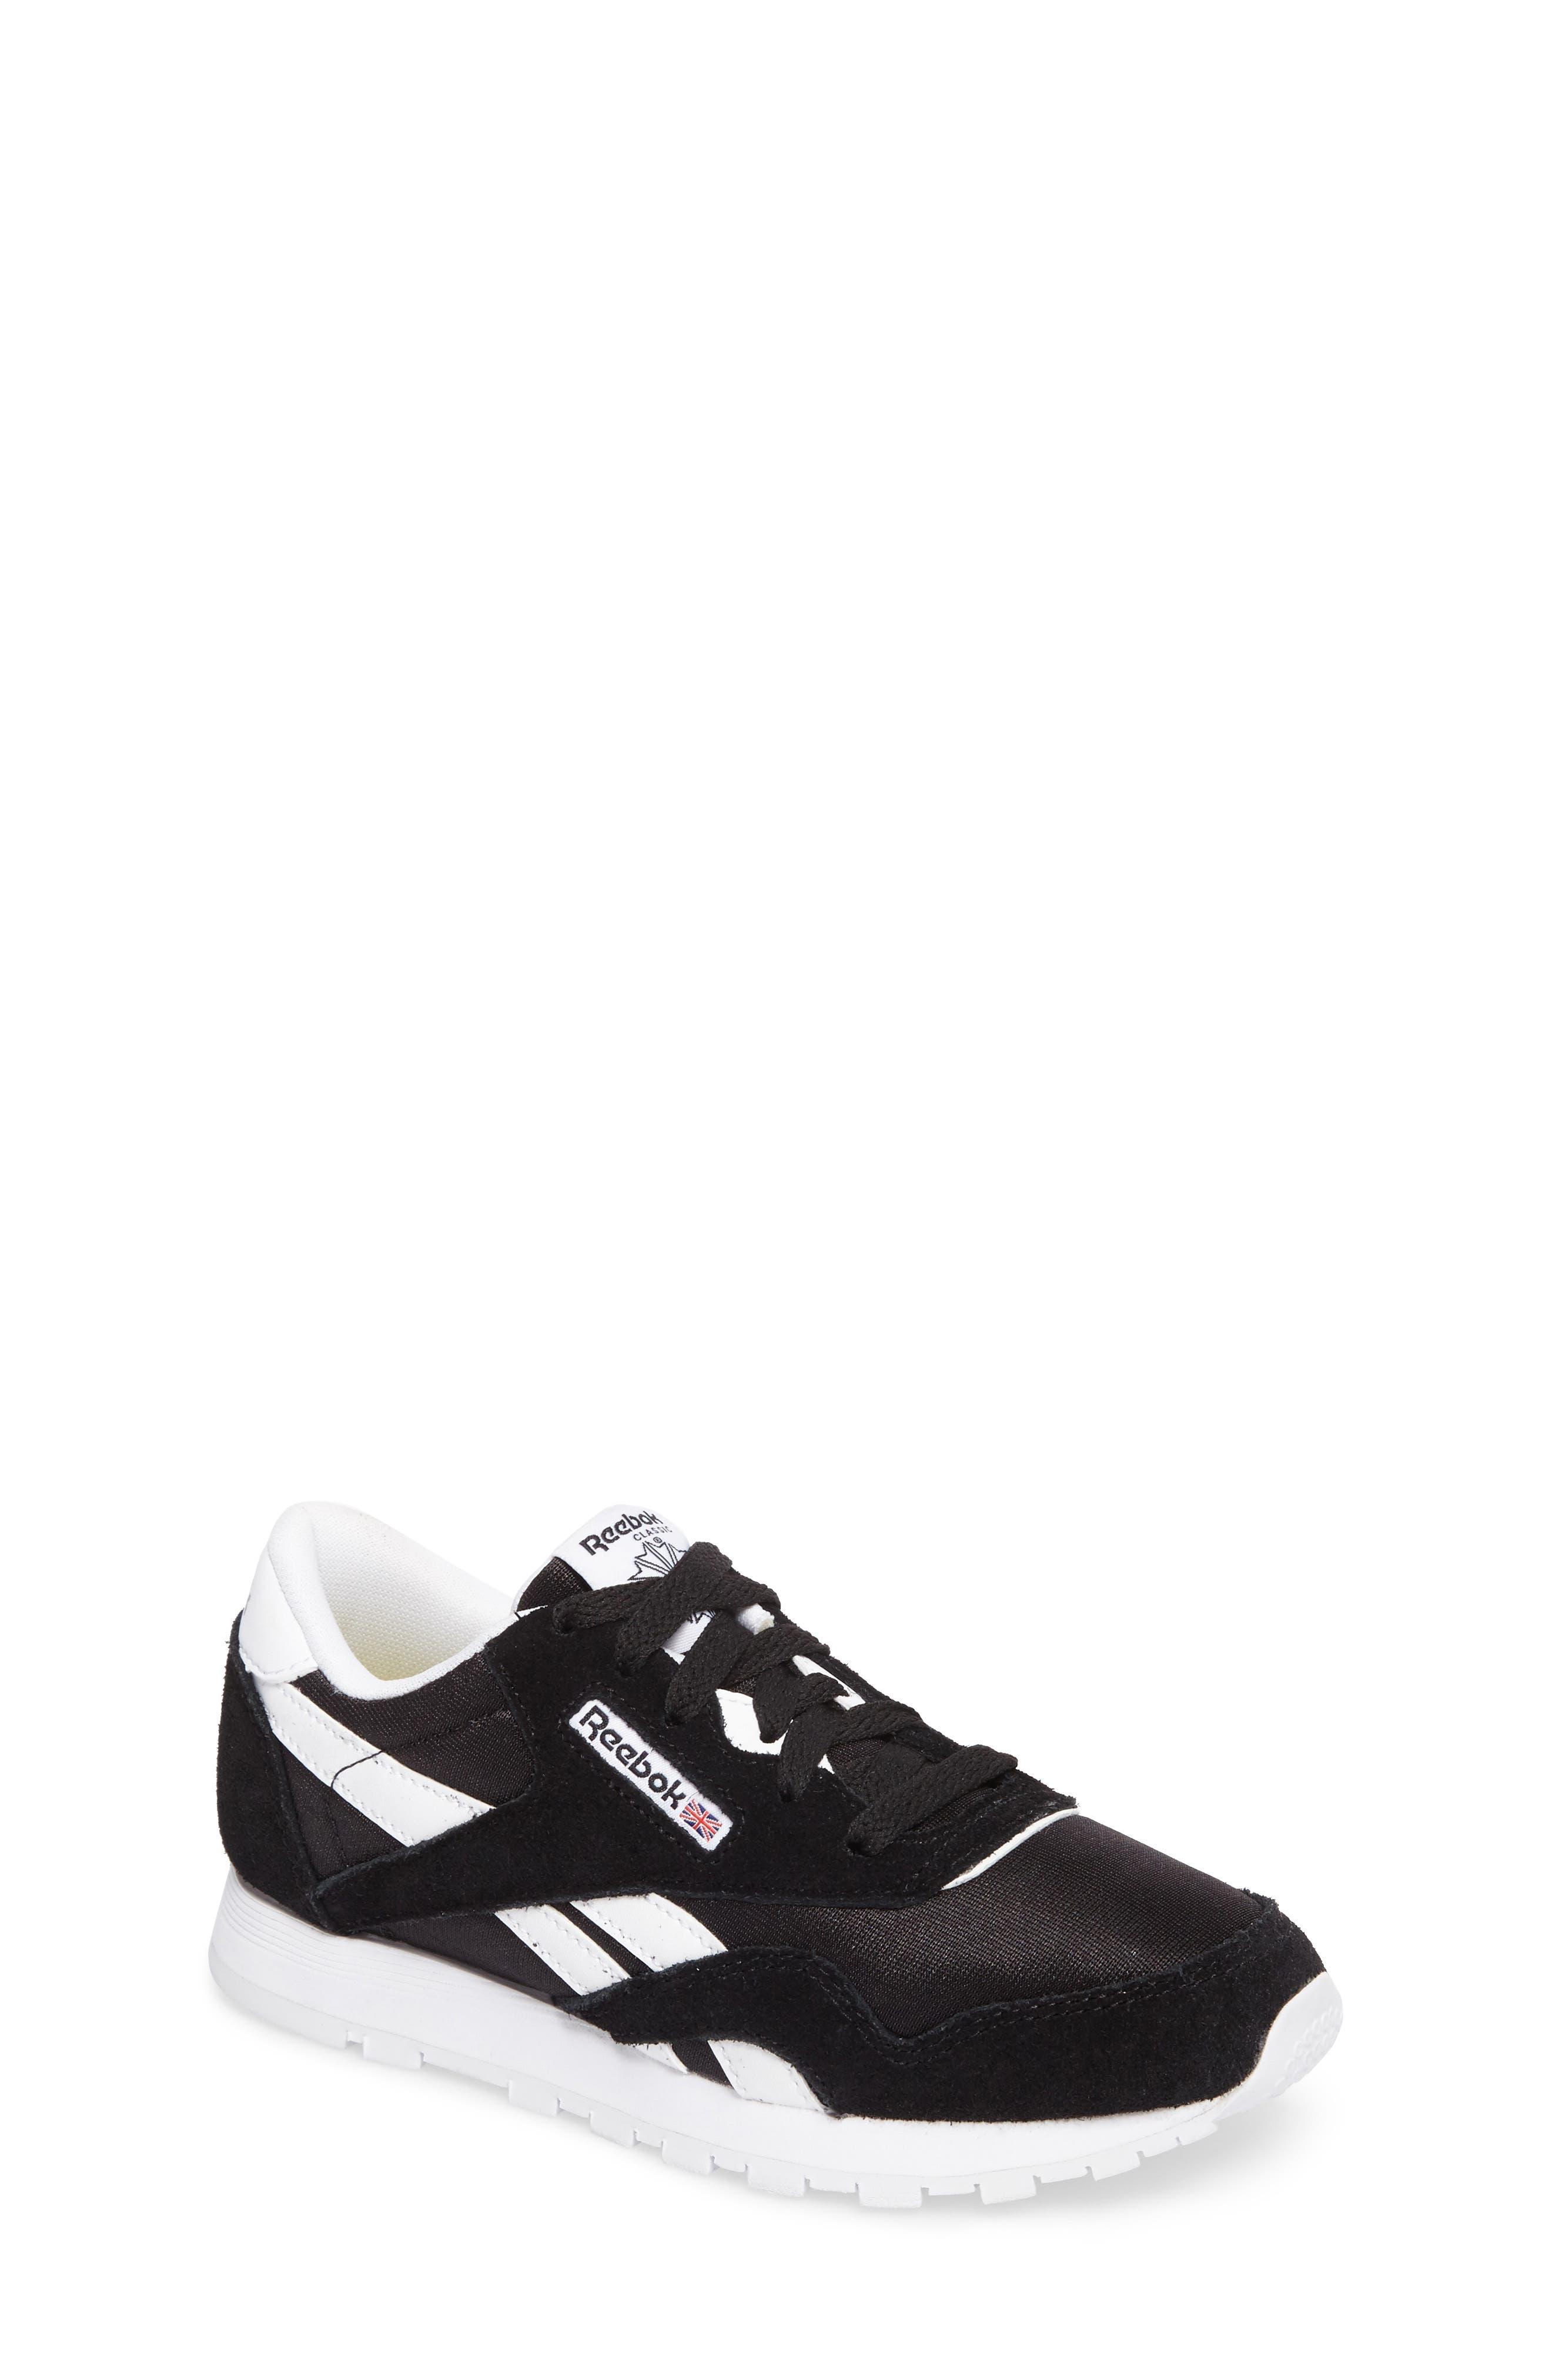 Reebok Classic Sneaker (Toddler, Little Kid & Big Kid)